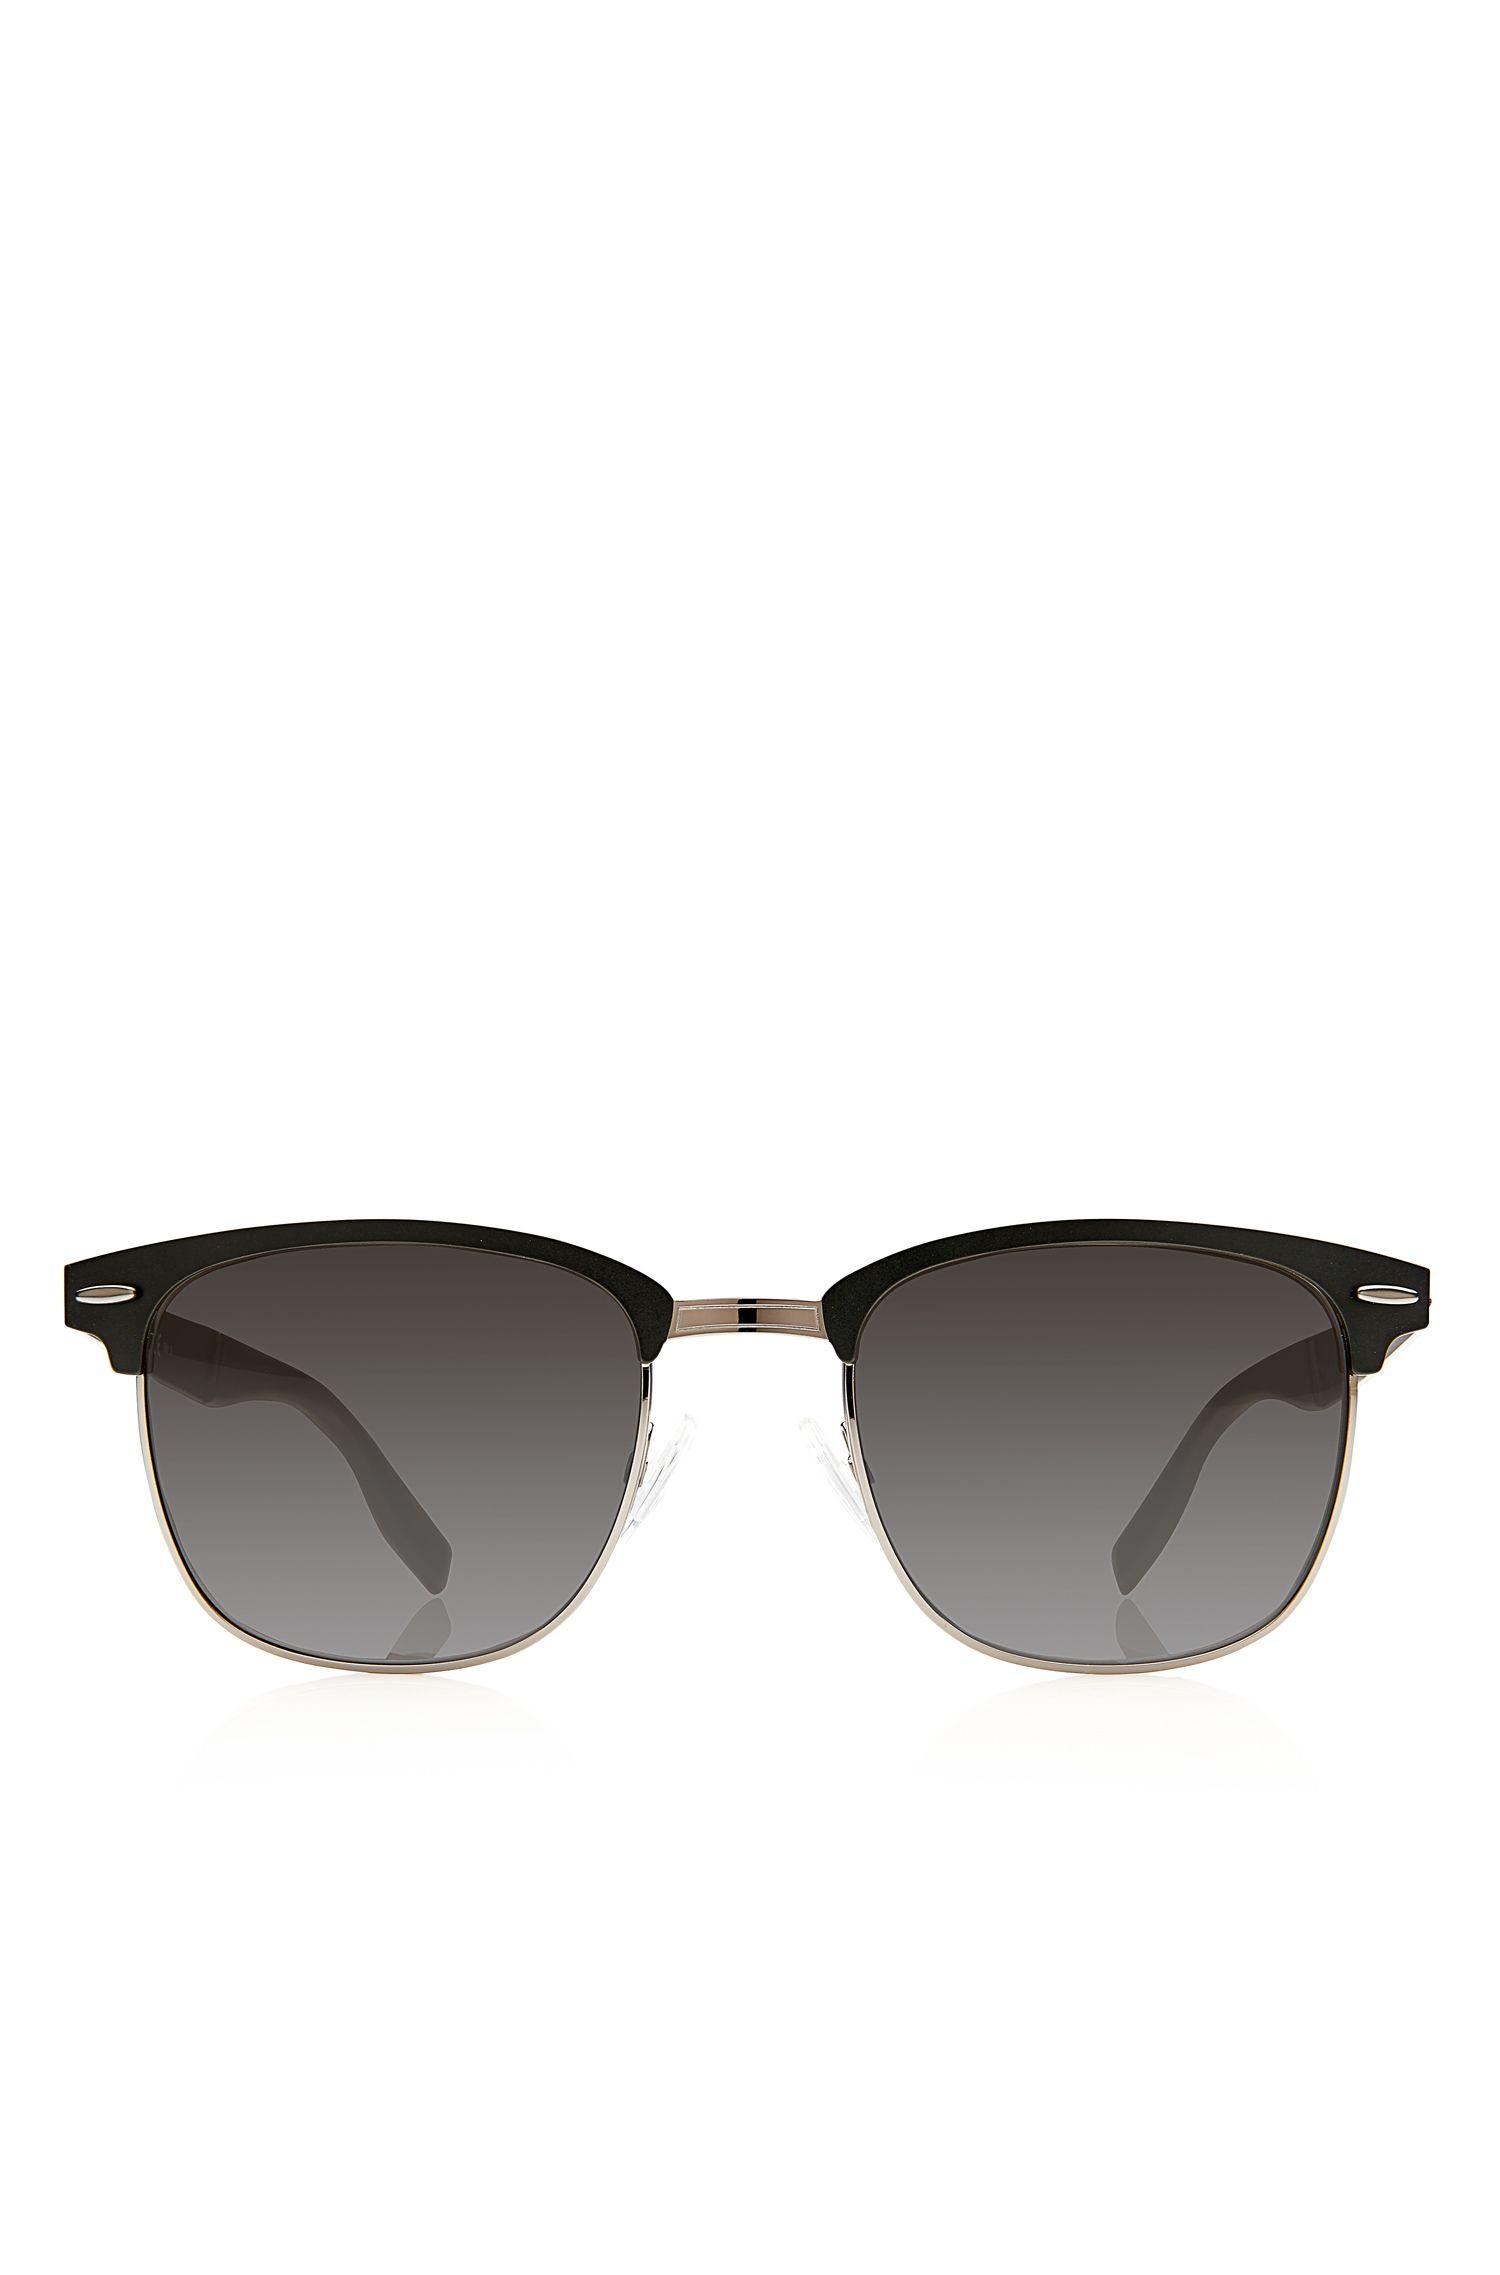 'Sunglasses' | Matte Black Semi-Rimless Sunglasses